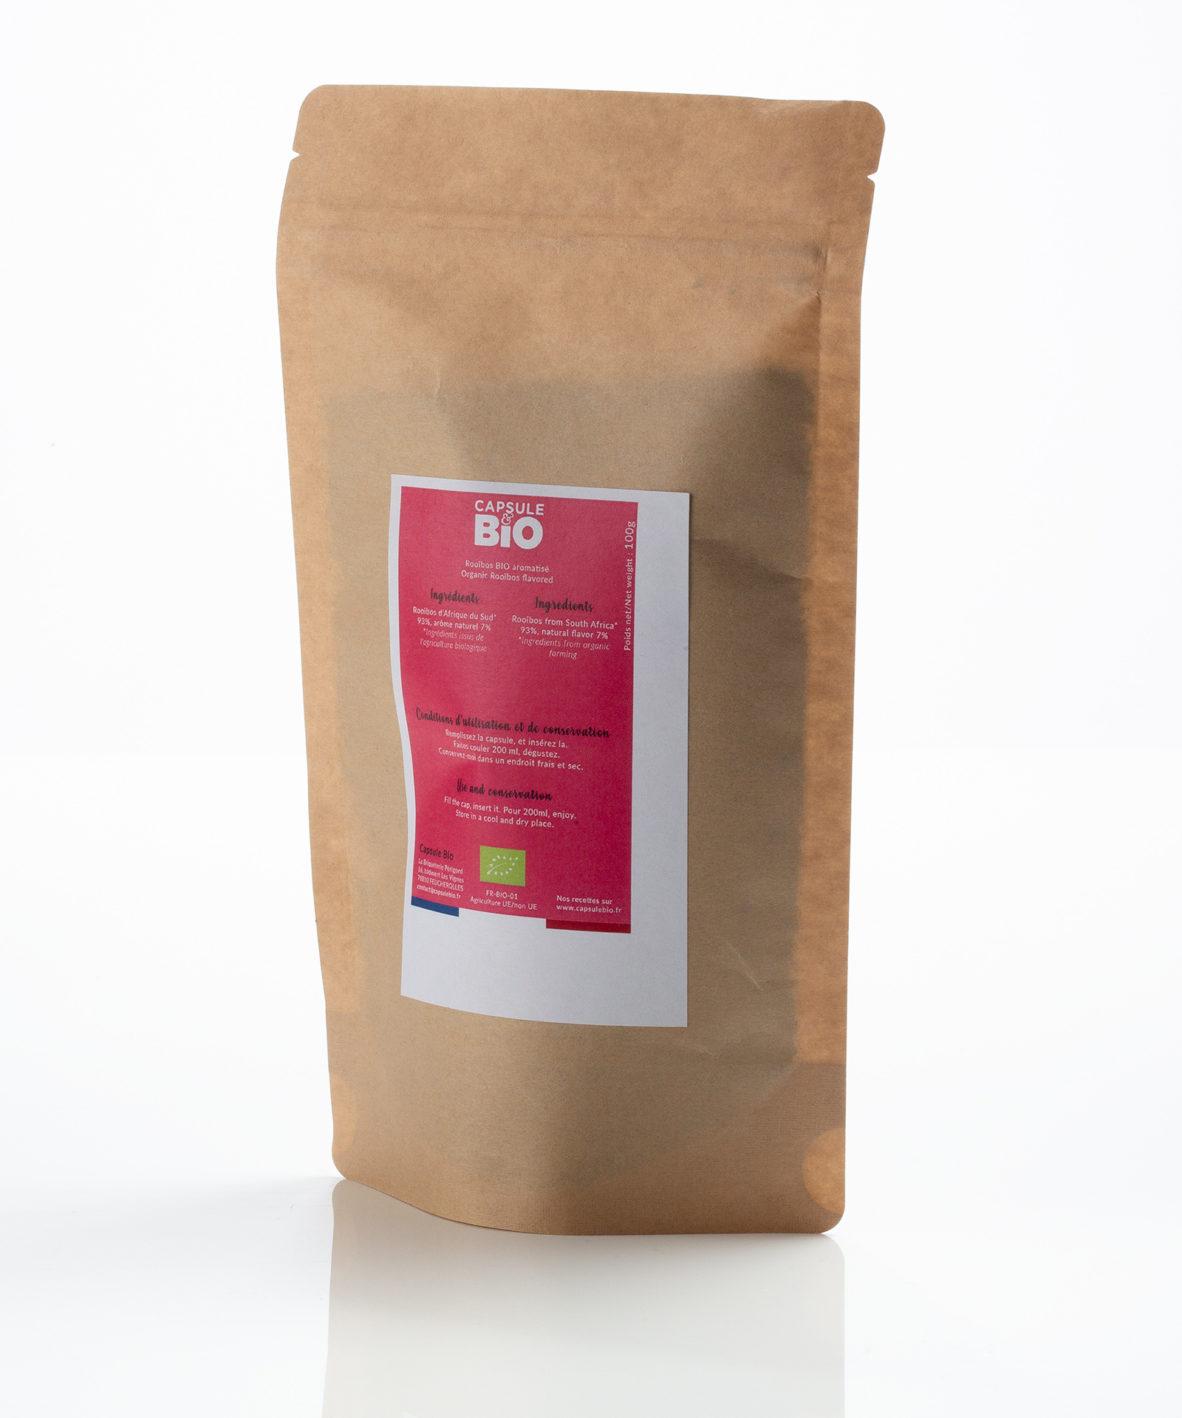 Capsulebio sachet infusion en vrac recette rooibos bio vanille